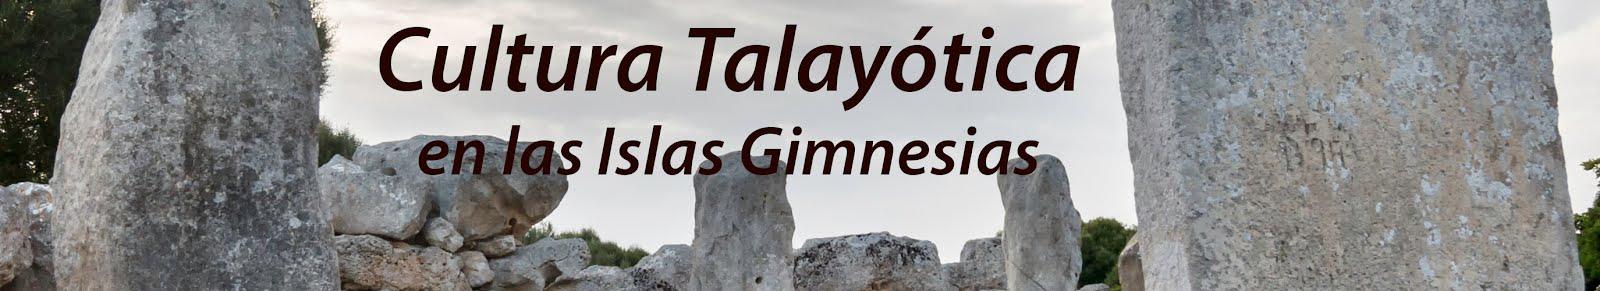 Cultura Talayótica